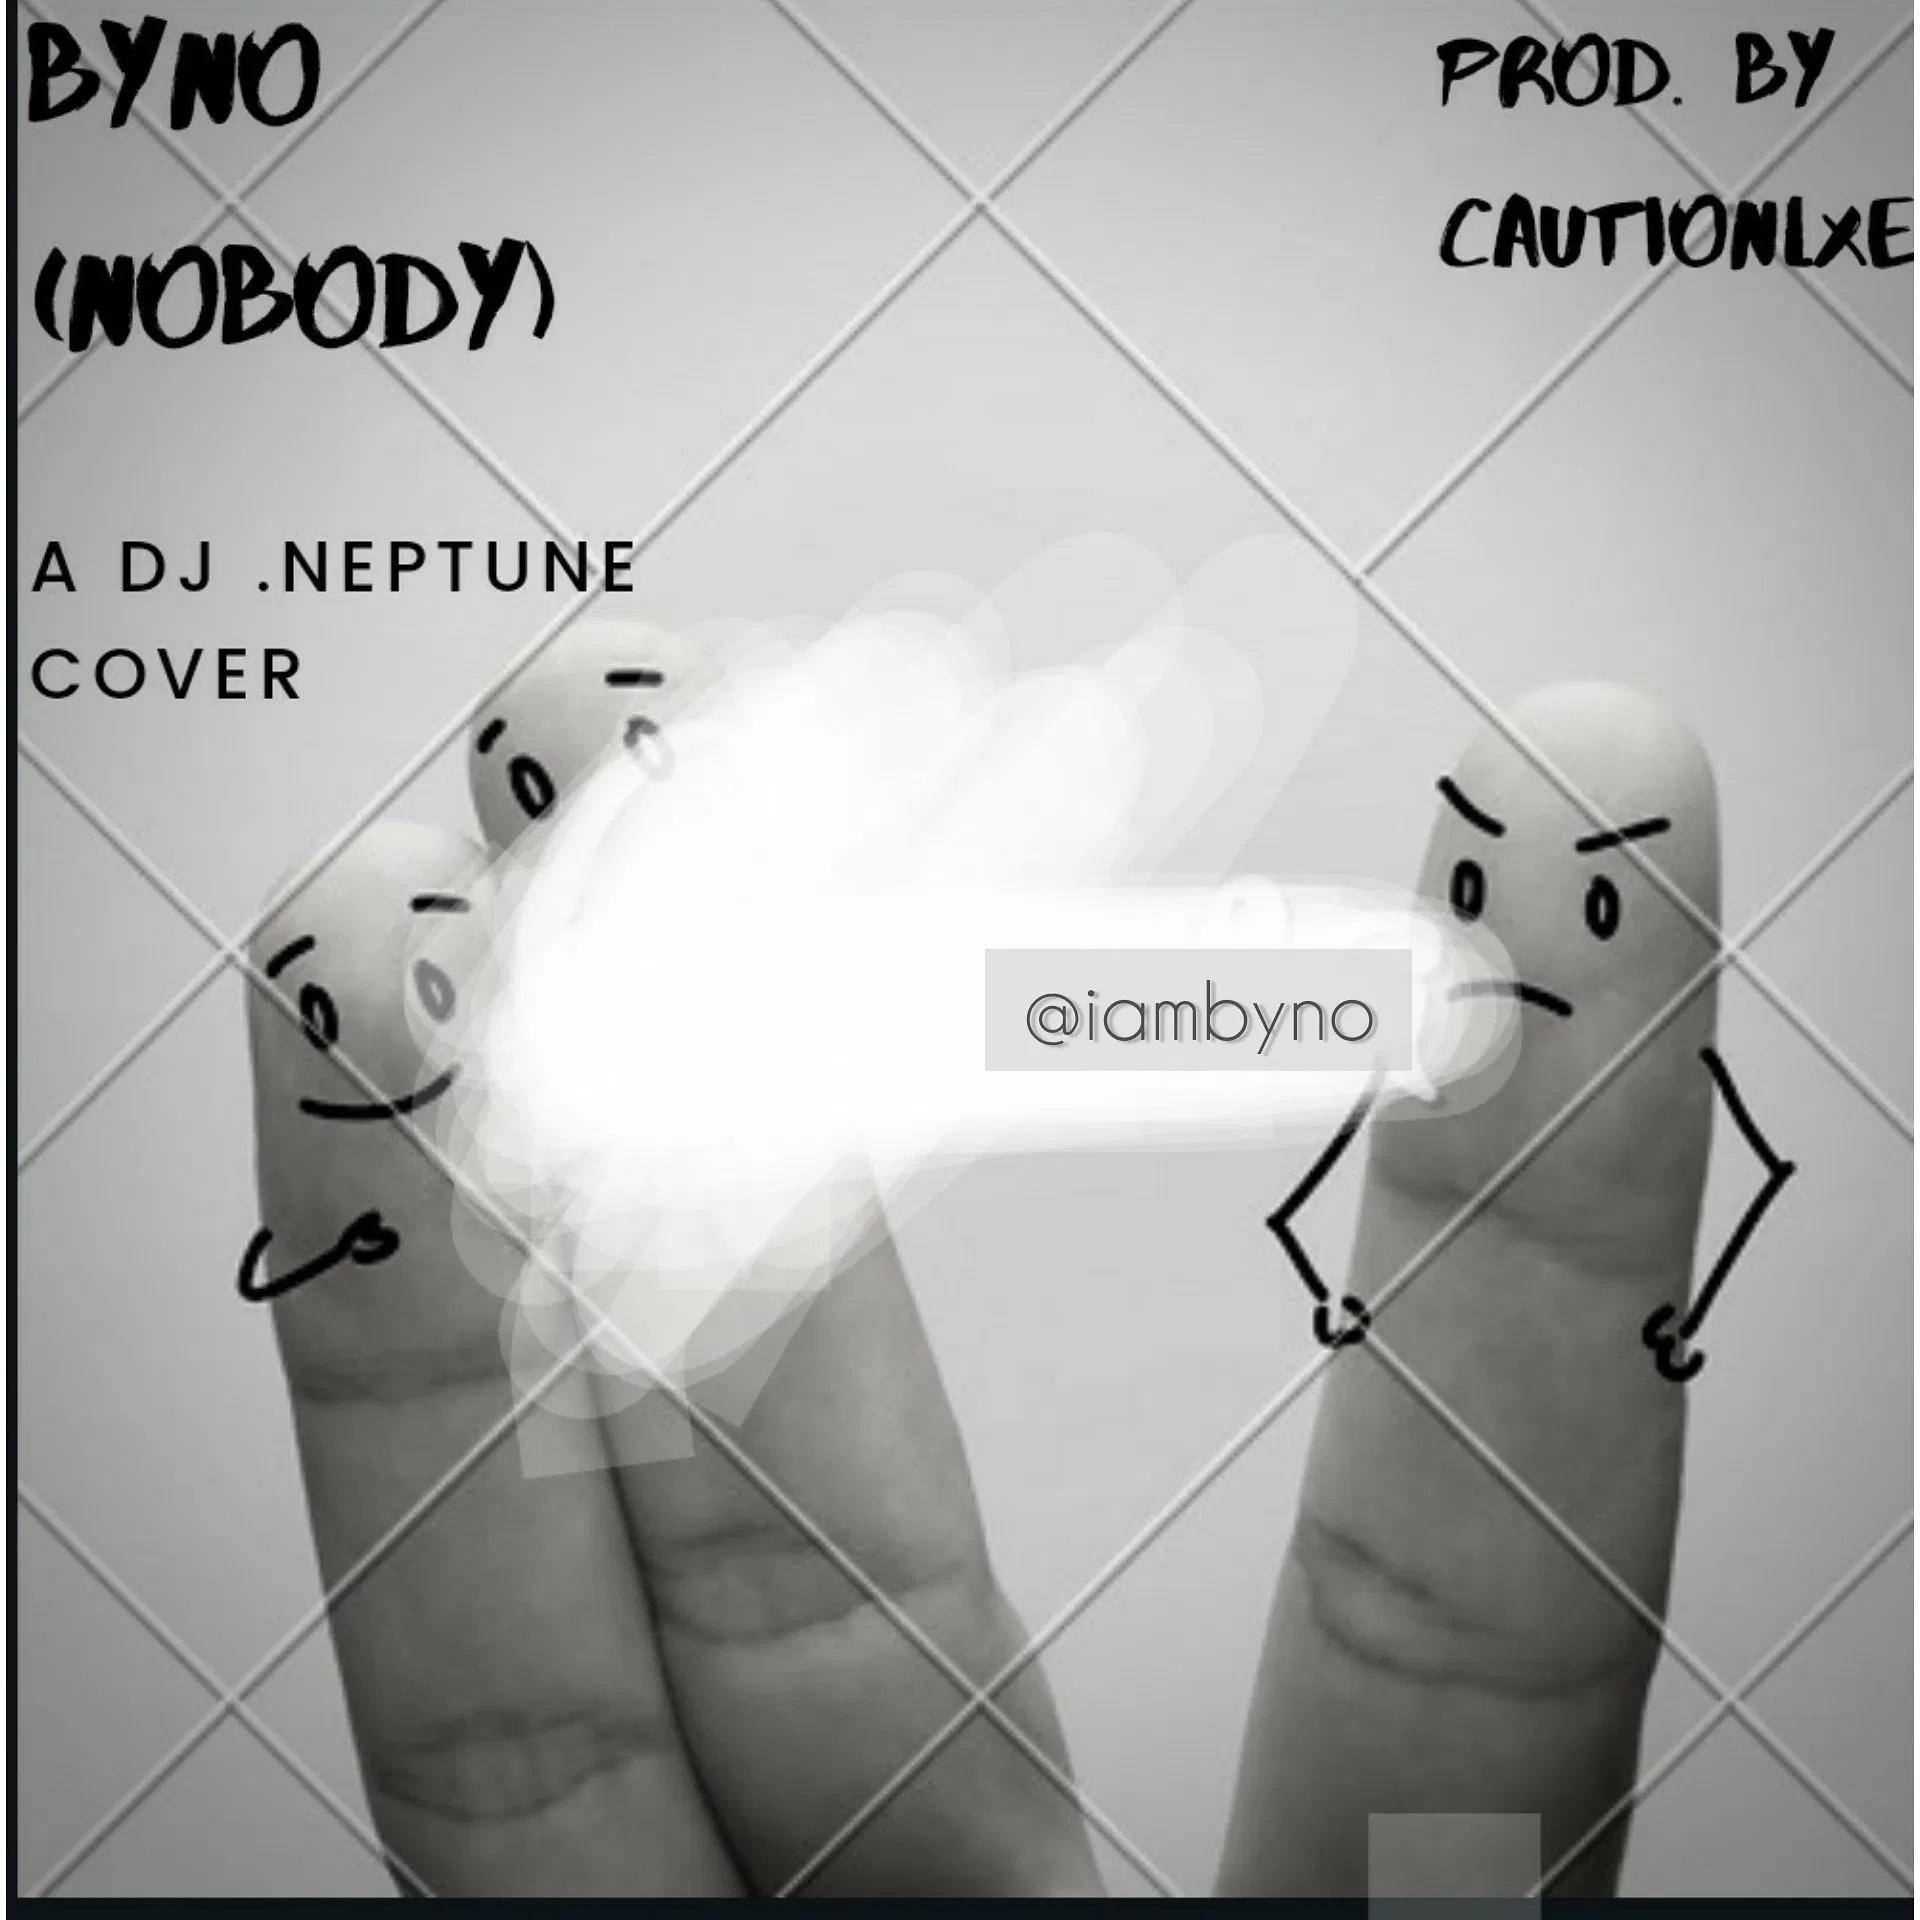 Byno Nobody A Dj Neptune Refix Audio Download Mp3 Music Woo yeah, yeah, yeah, yeah, yeah woo yo, yo! byno nobody a dj neptune refix